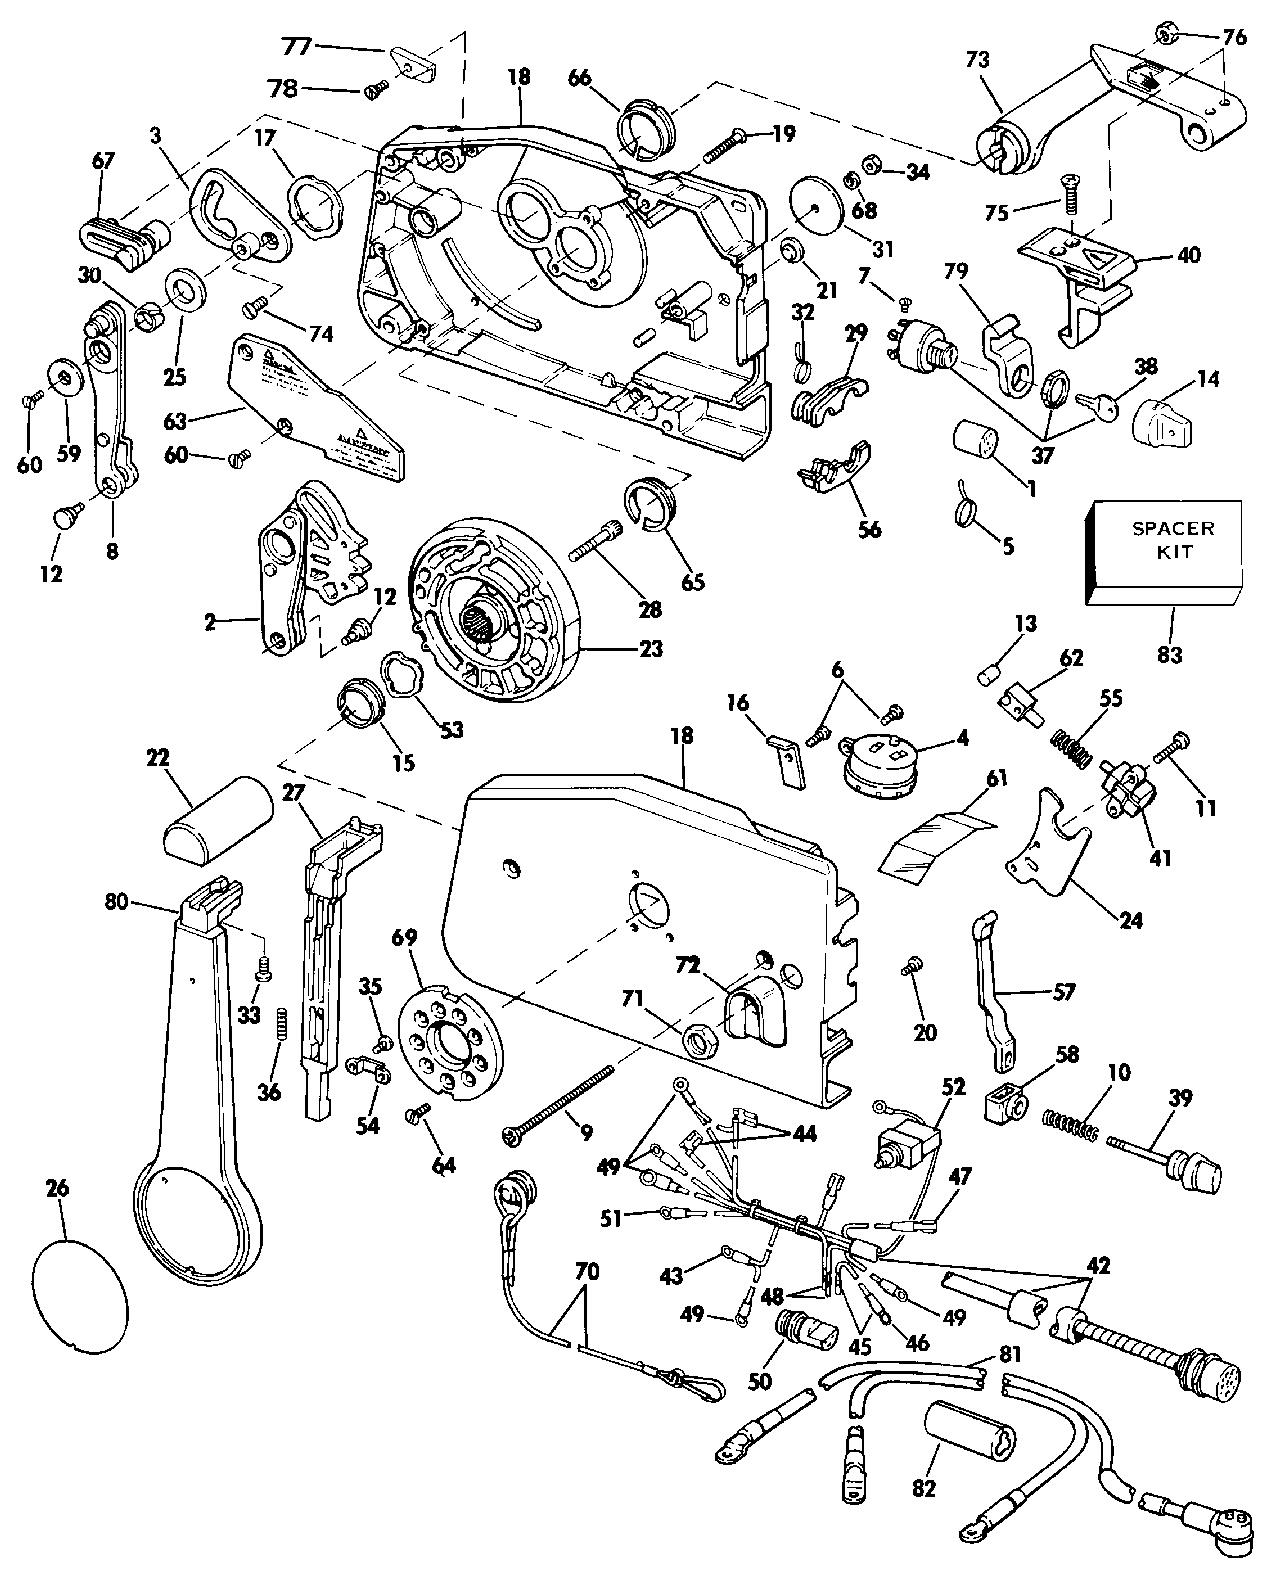 hight resolution of omc throttle control box wiring diagram schematic diagram data omc outboard control box diagram omc control box diagram